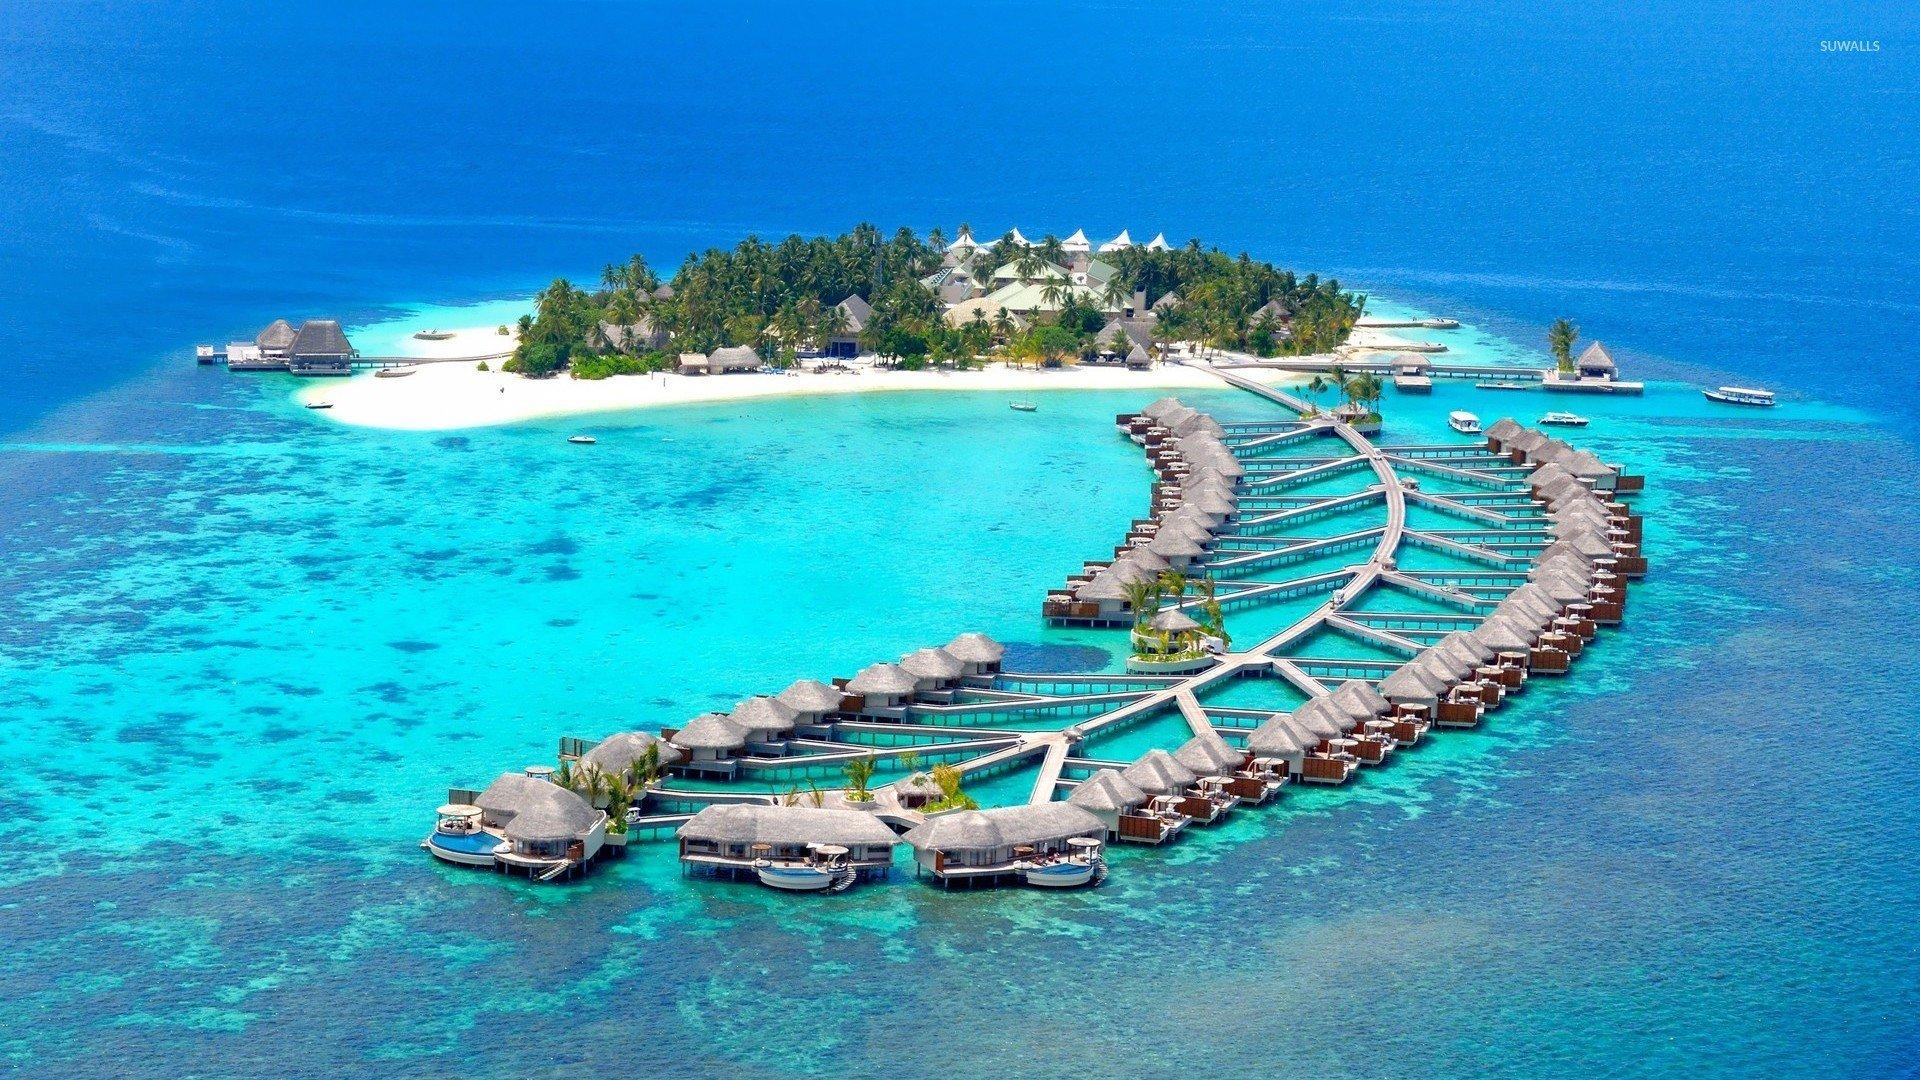 Maldives Beach Wallpaper: Maldives Island Resorts Wallpaper